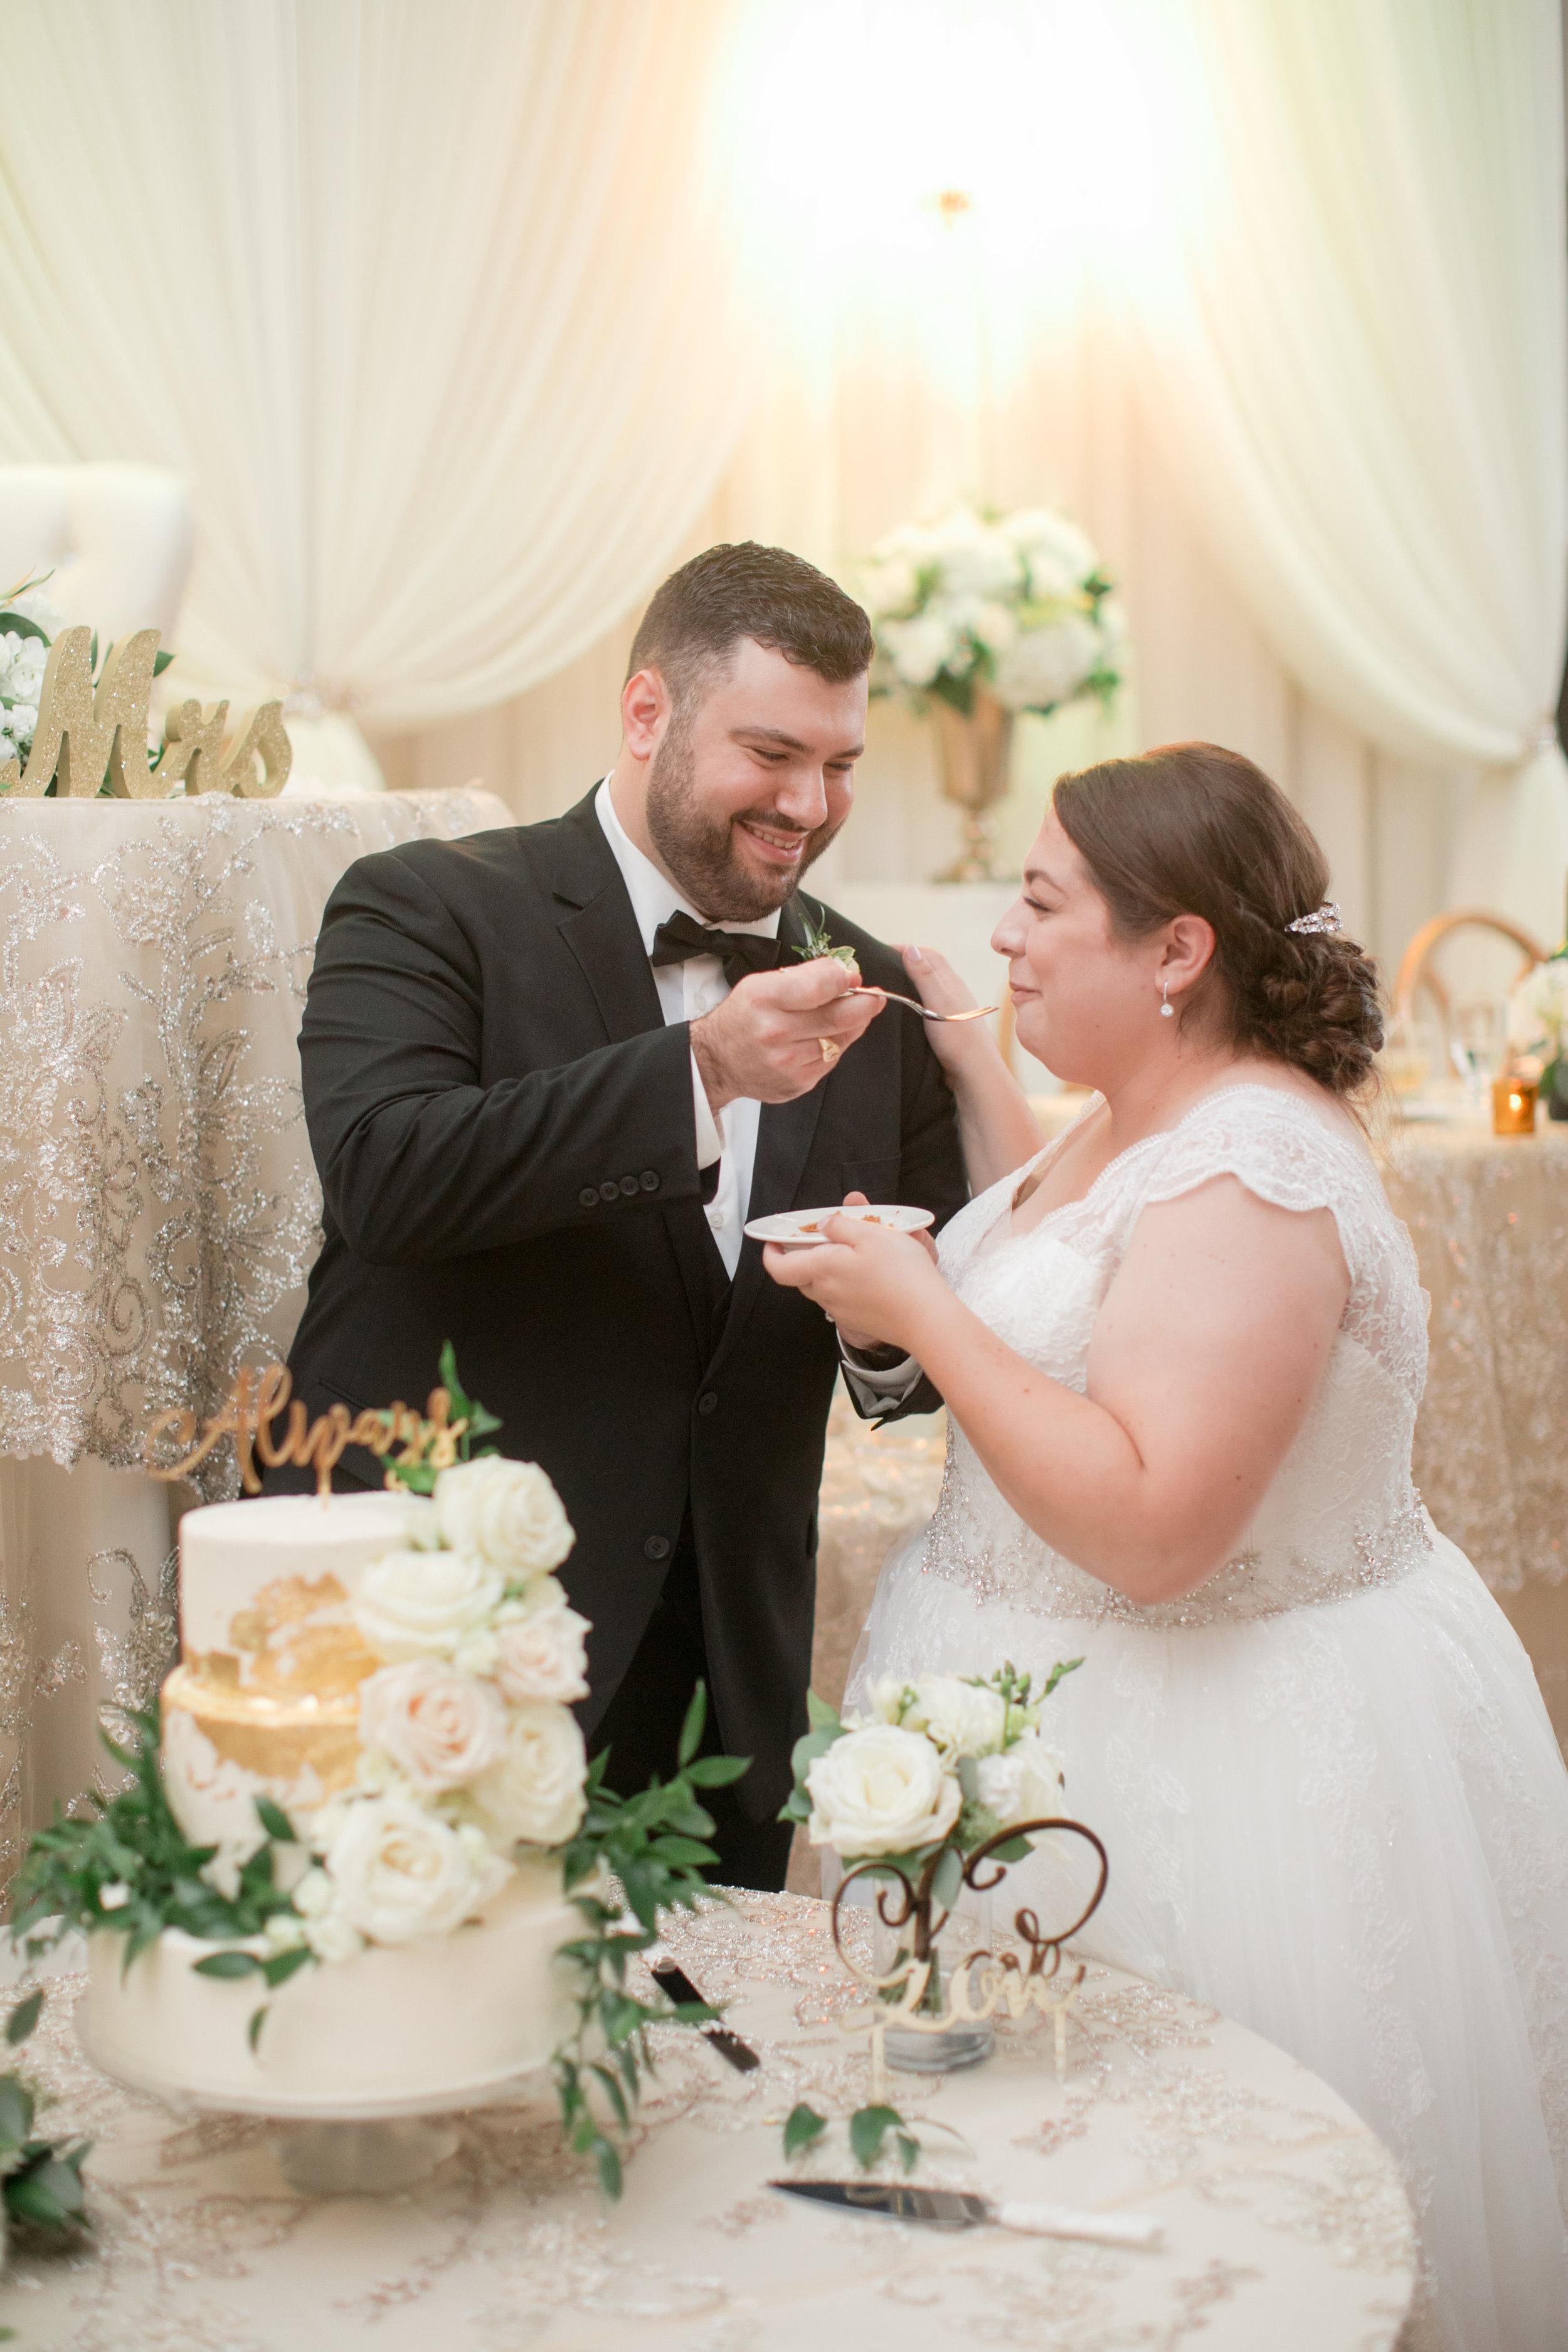 Alissa + Vince - Daniel Ricci Weddings -0611.jpg